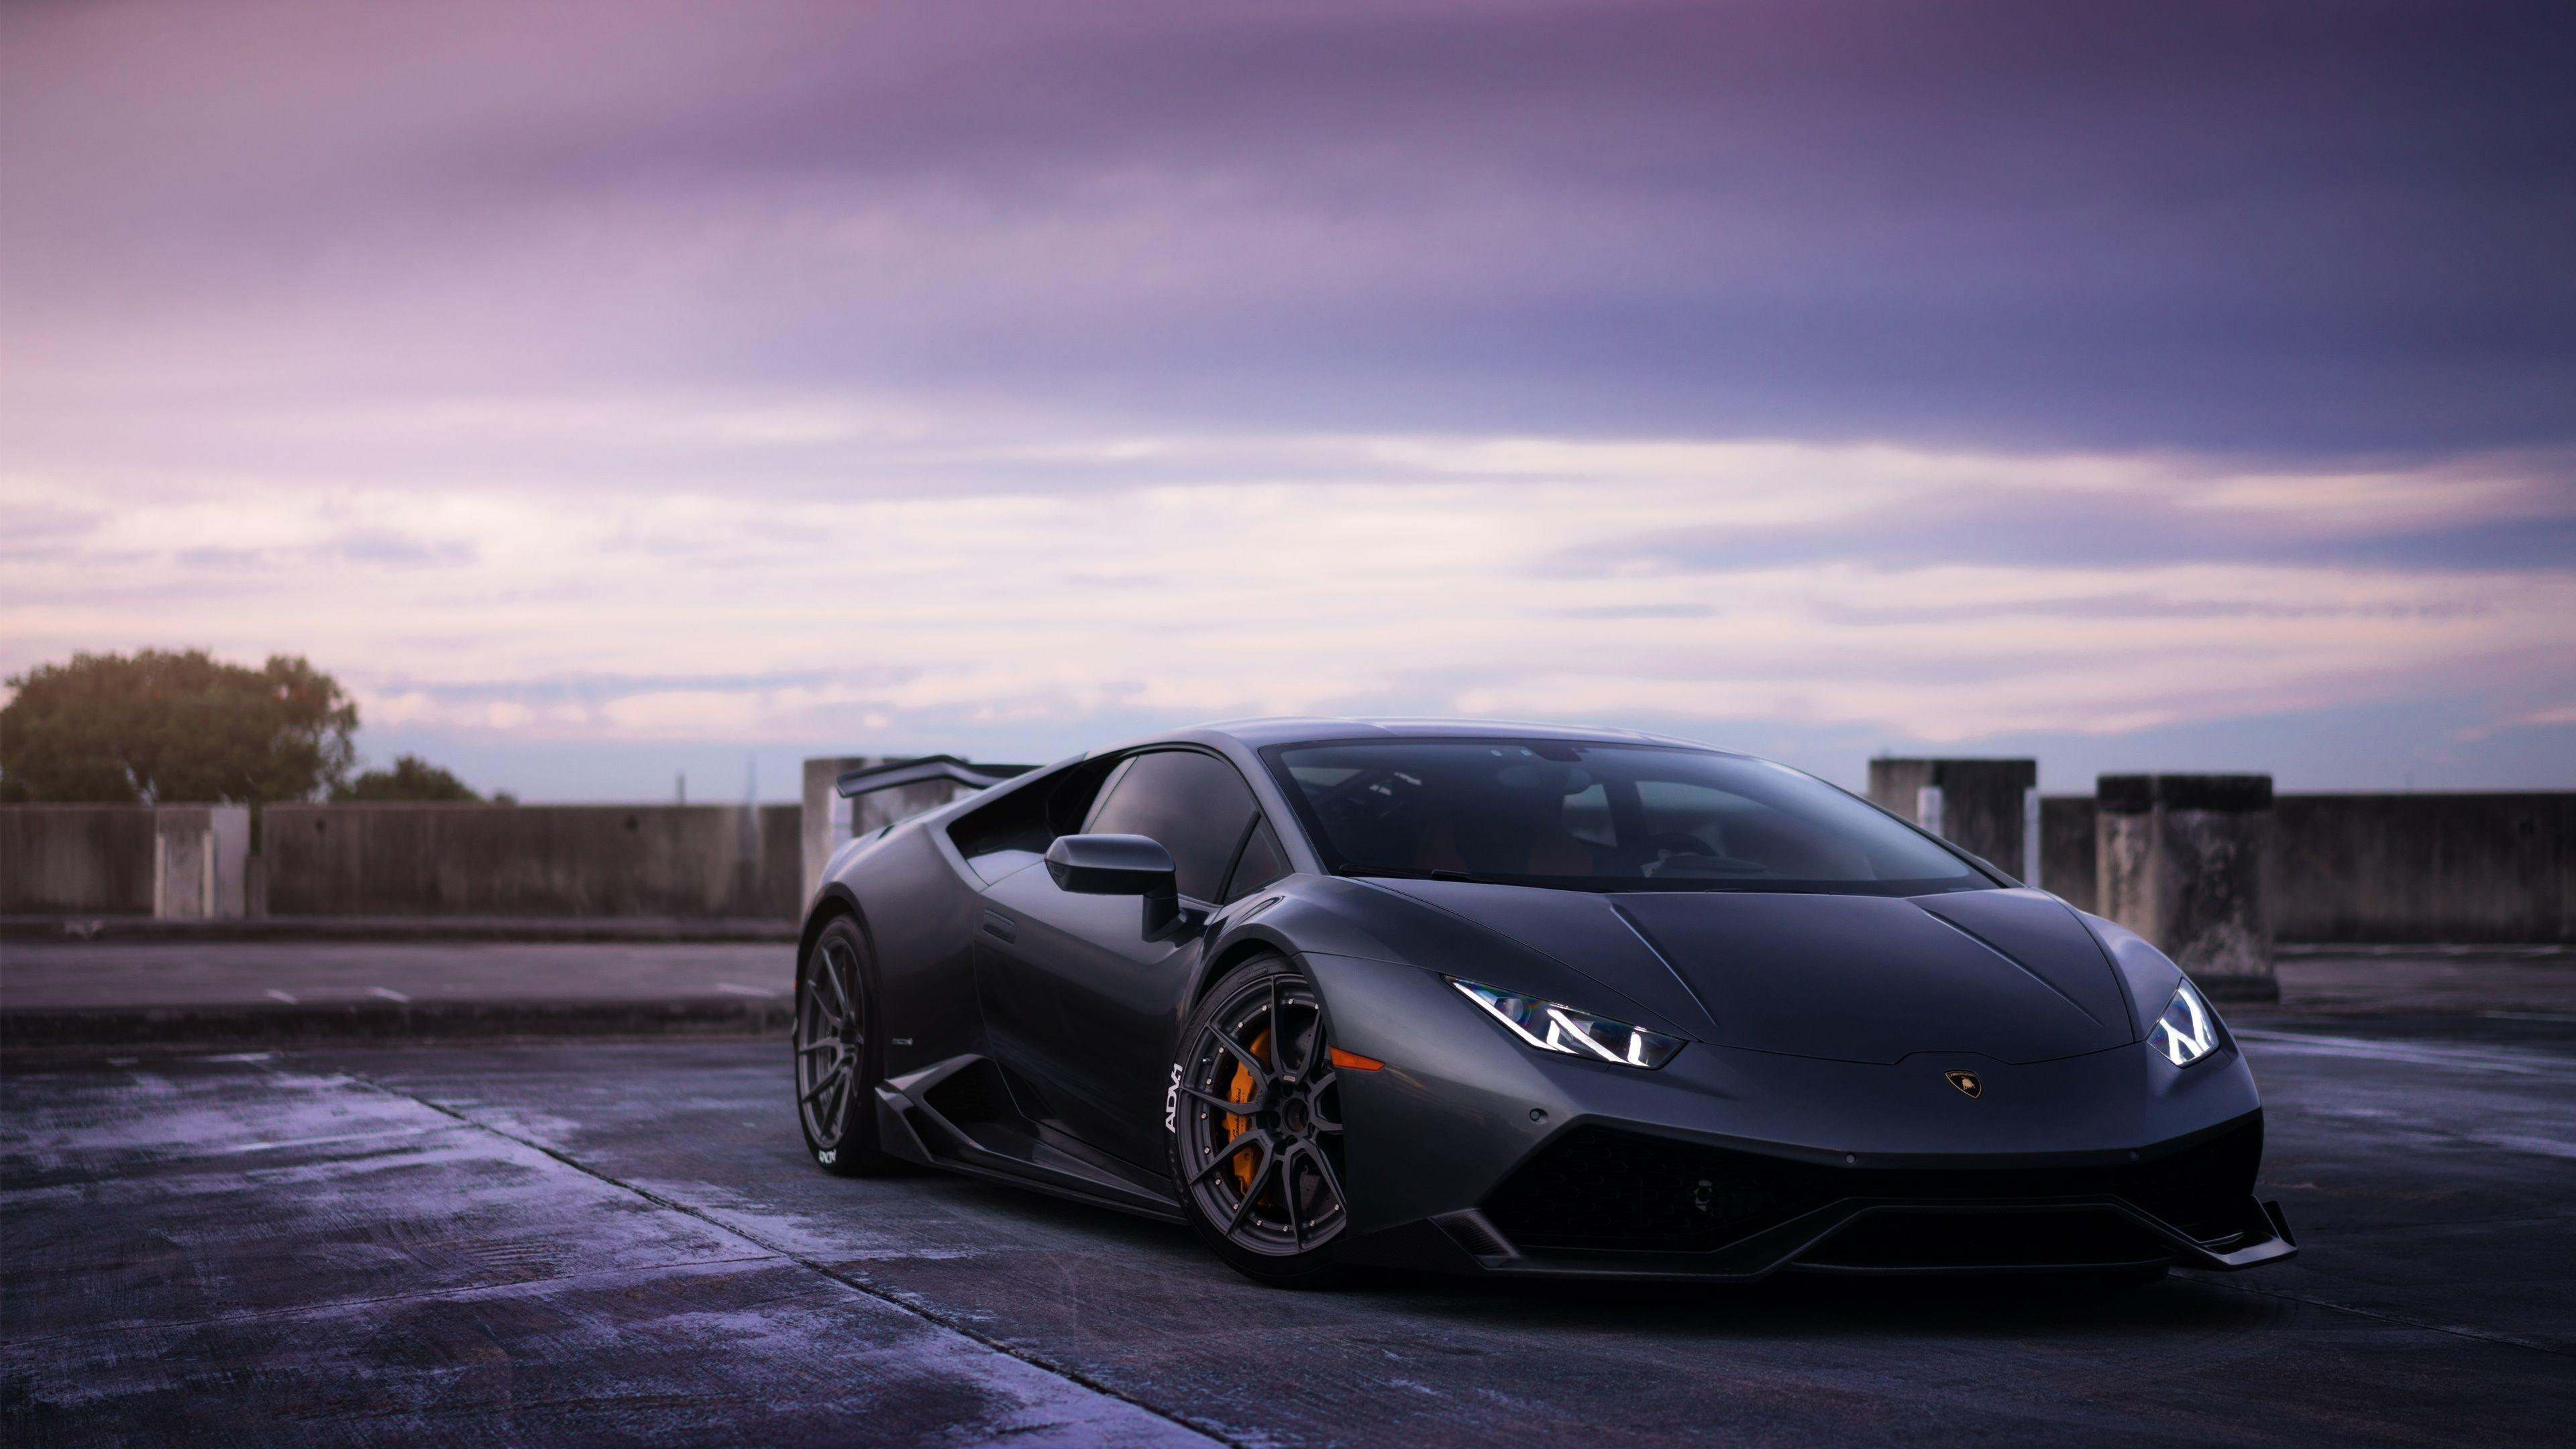 Lamborghini Huracan Wallpaper Image Group 37 3840x2160